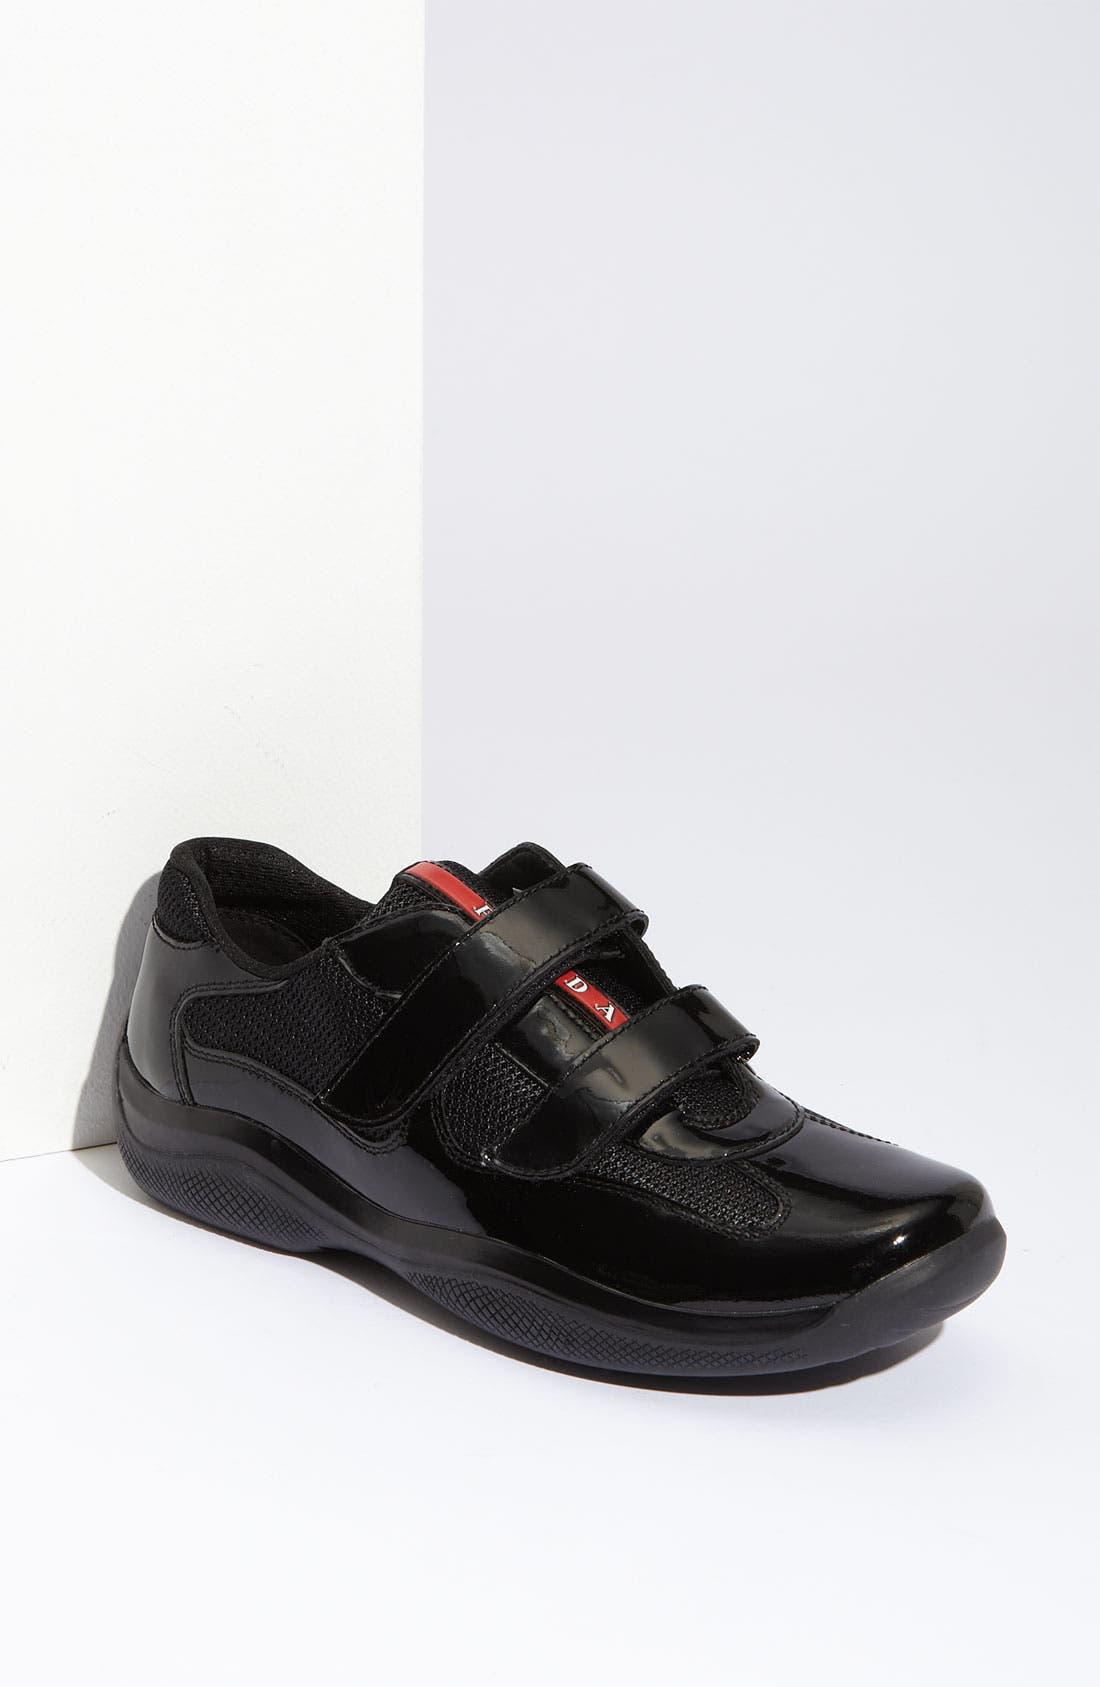 Main Image - Prada 'America's Cup' Patent Leather Sneaker